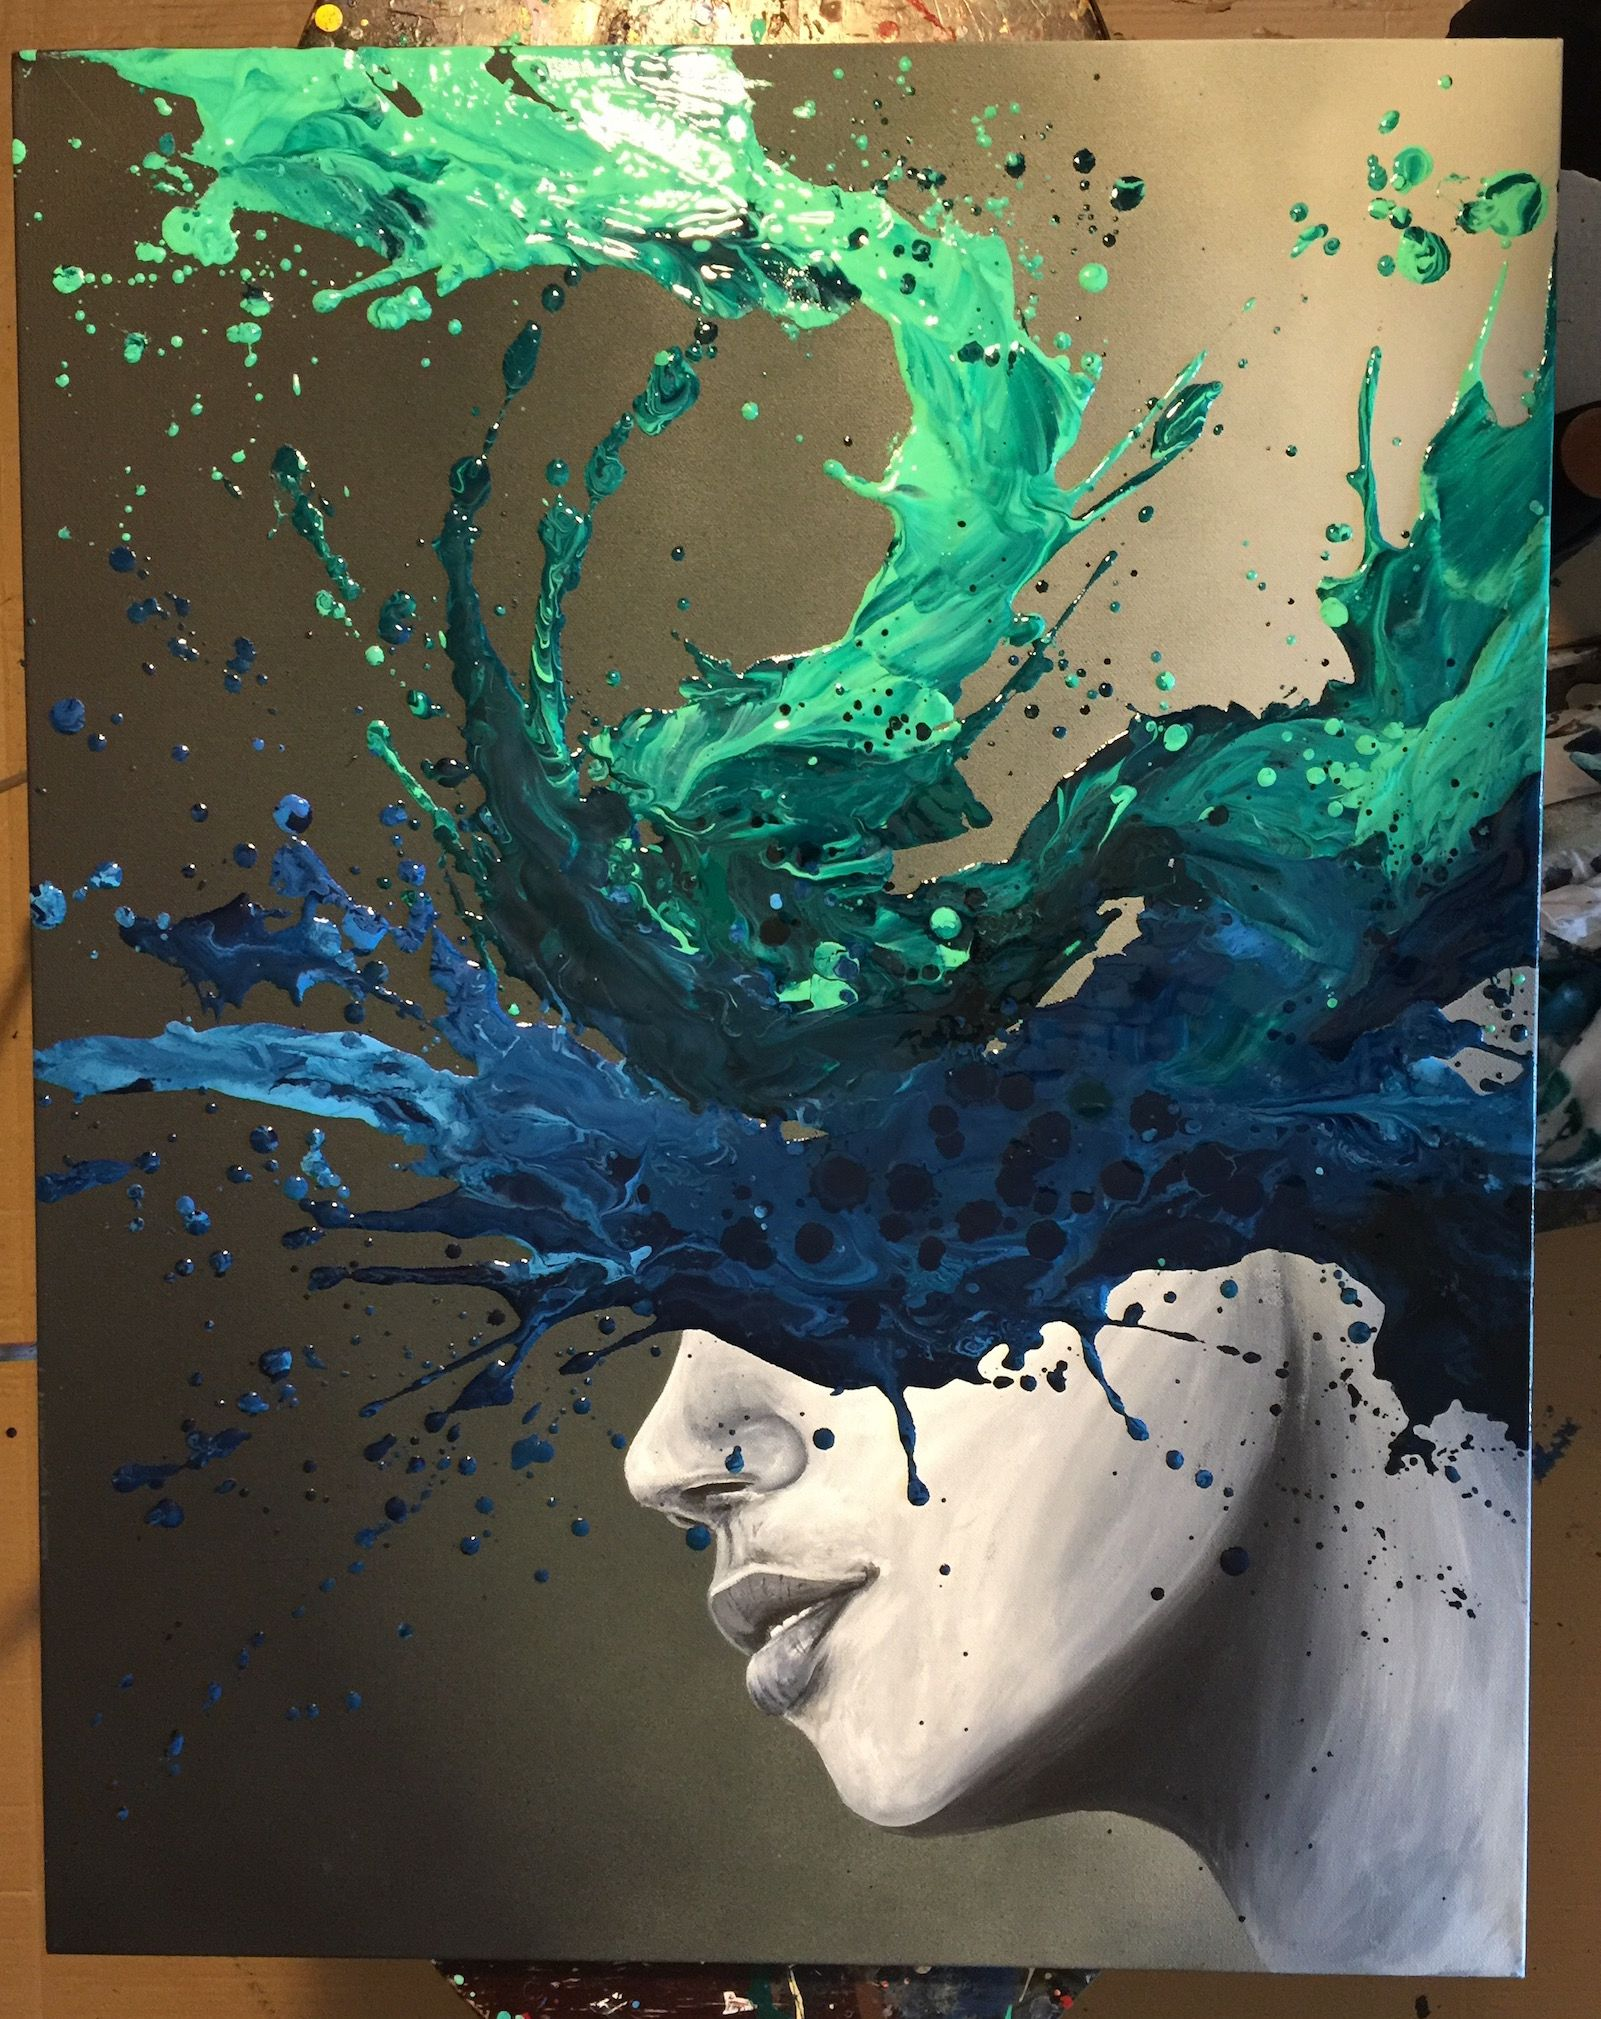 Kevin Vigil Aka Kre8 Check Out This Artist Www.kre8artafax